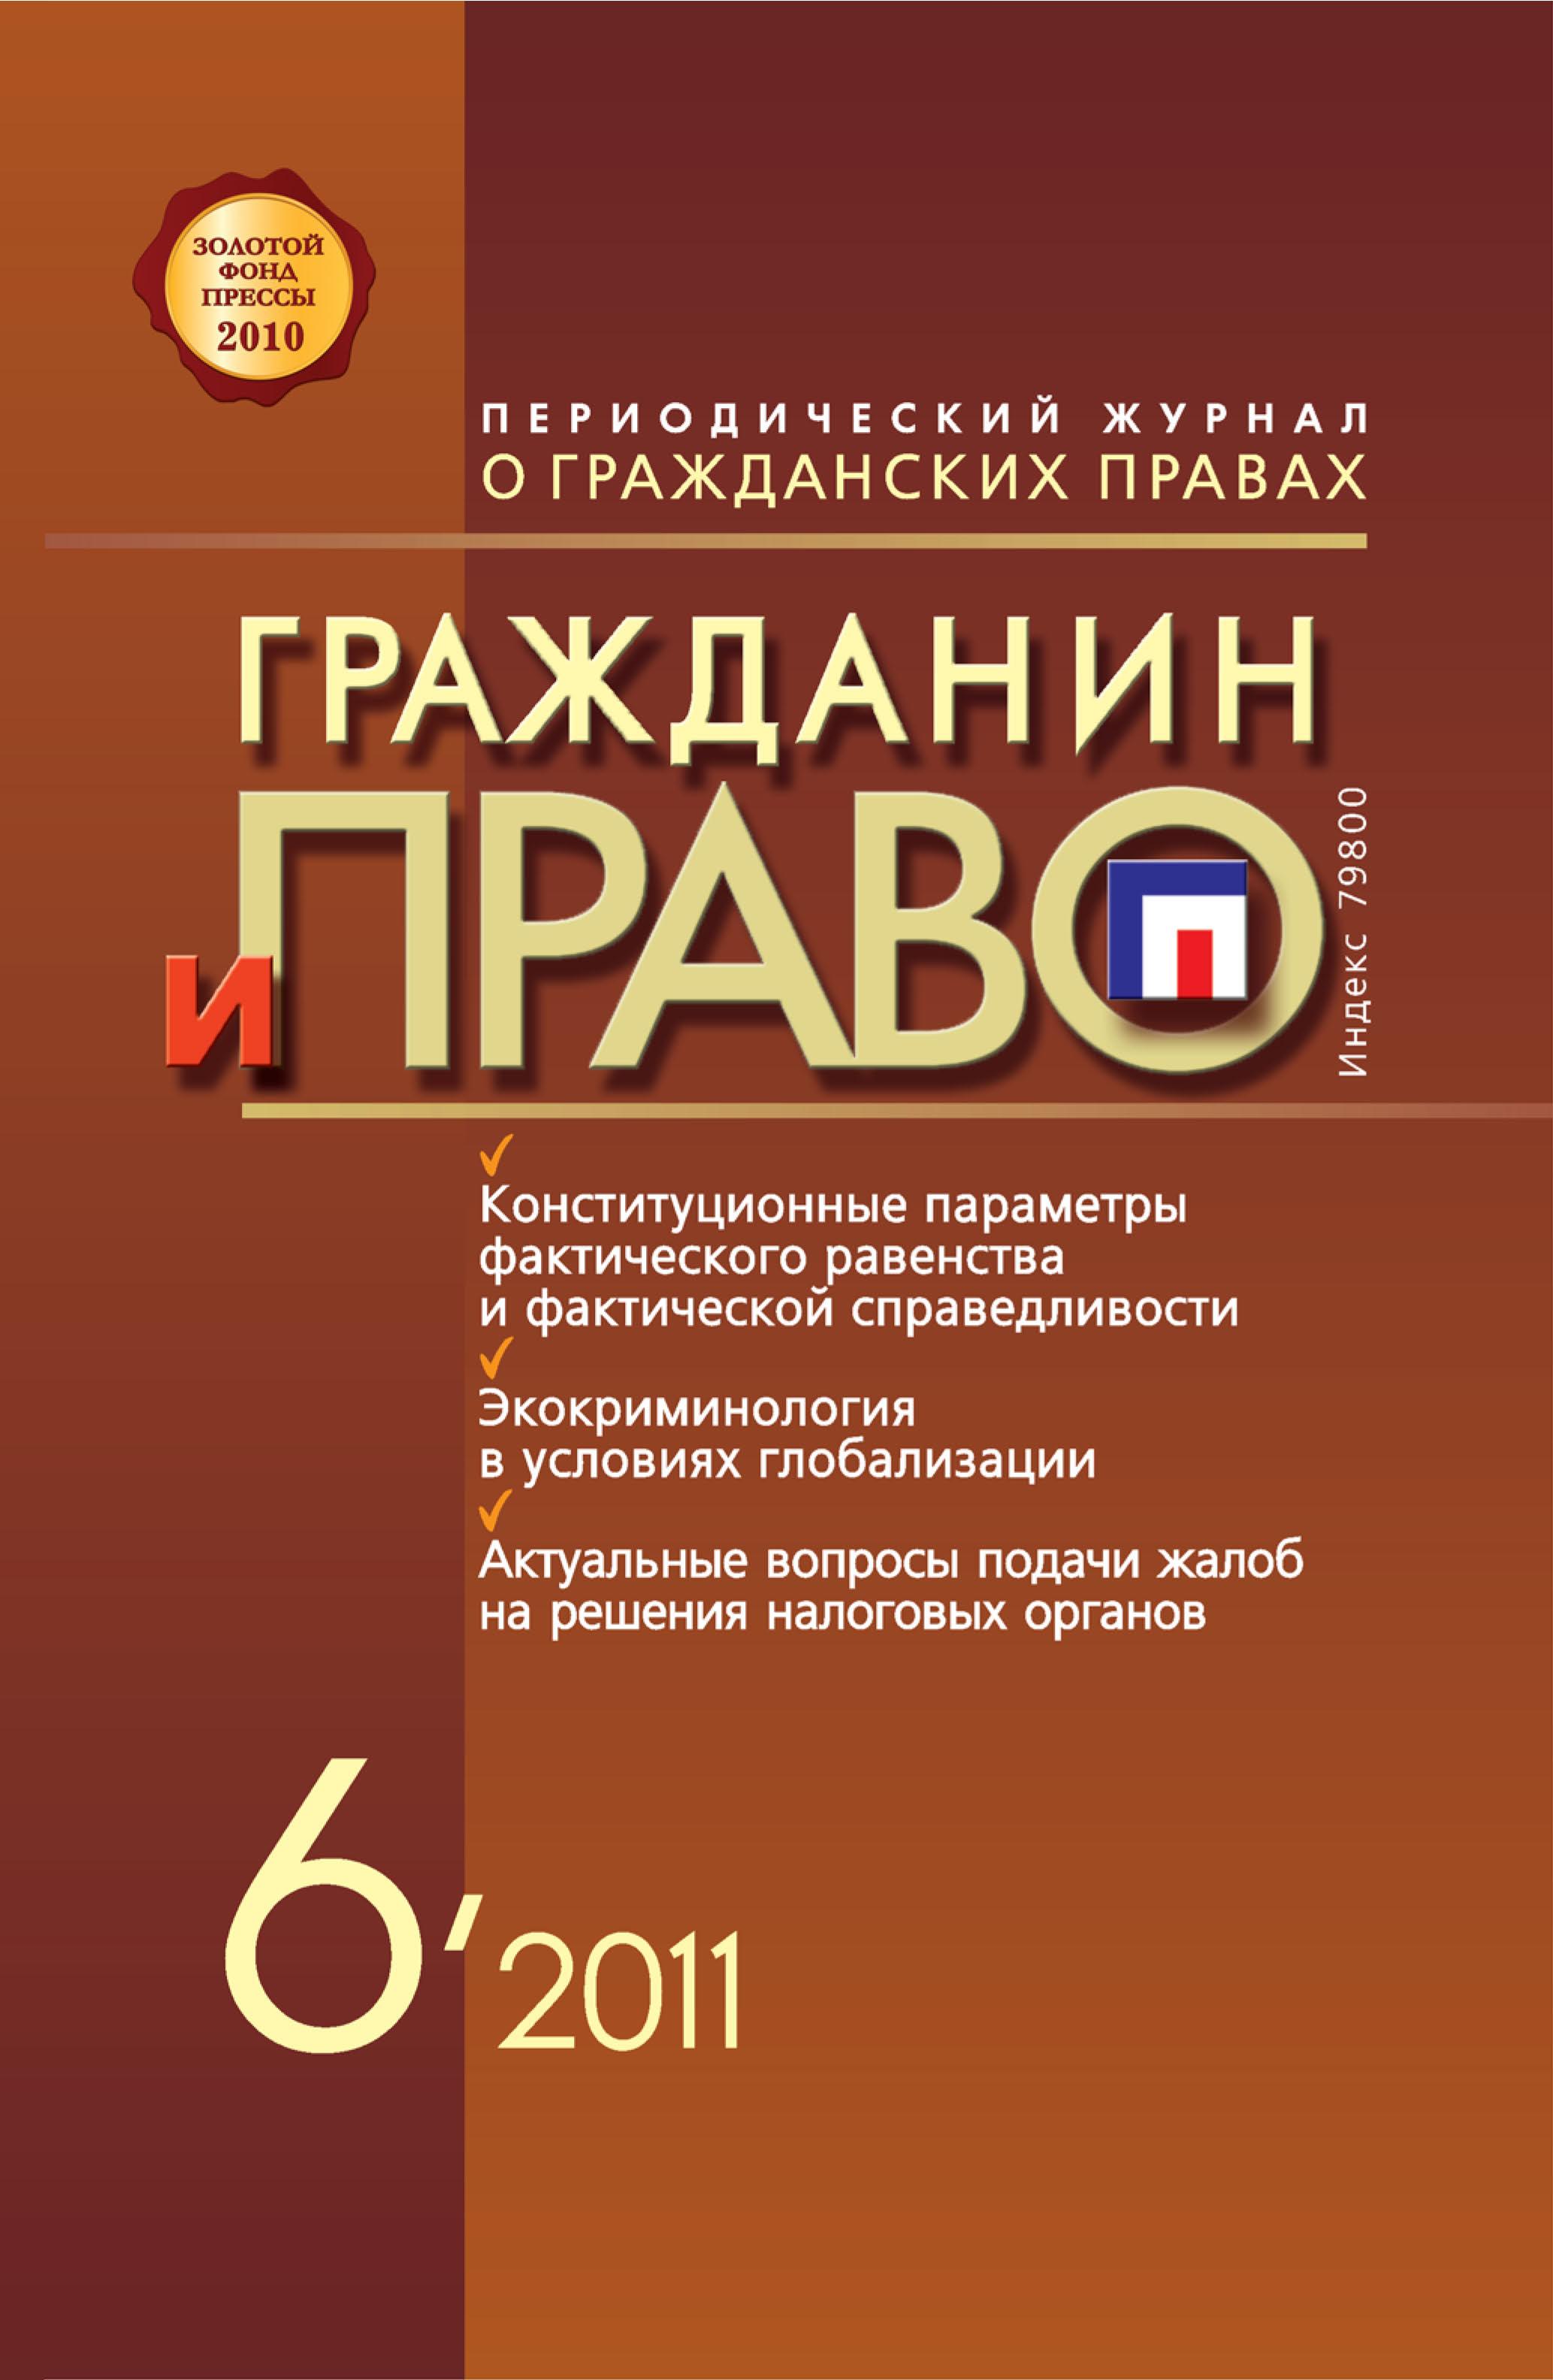 Гражданин и право №06/2011